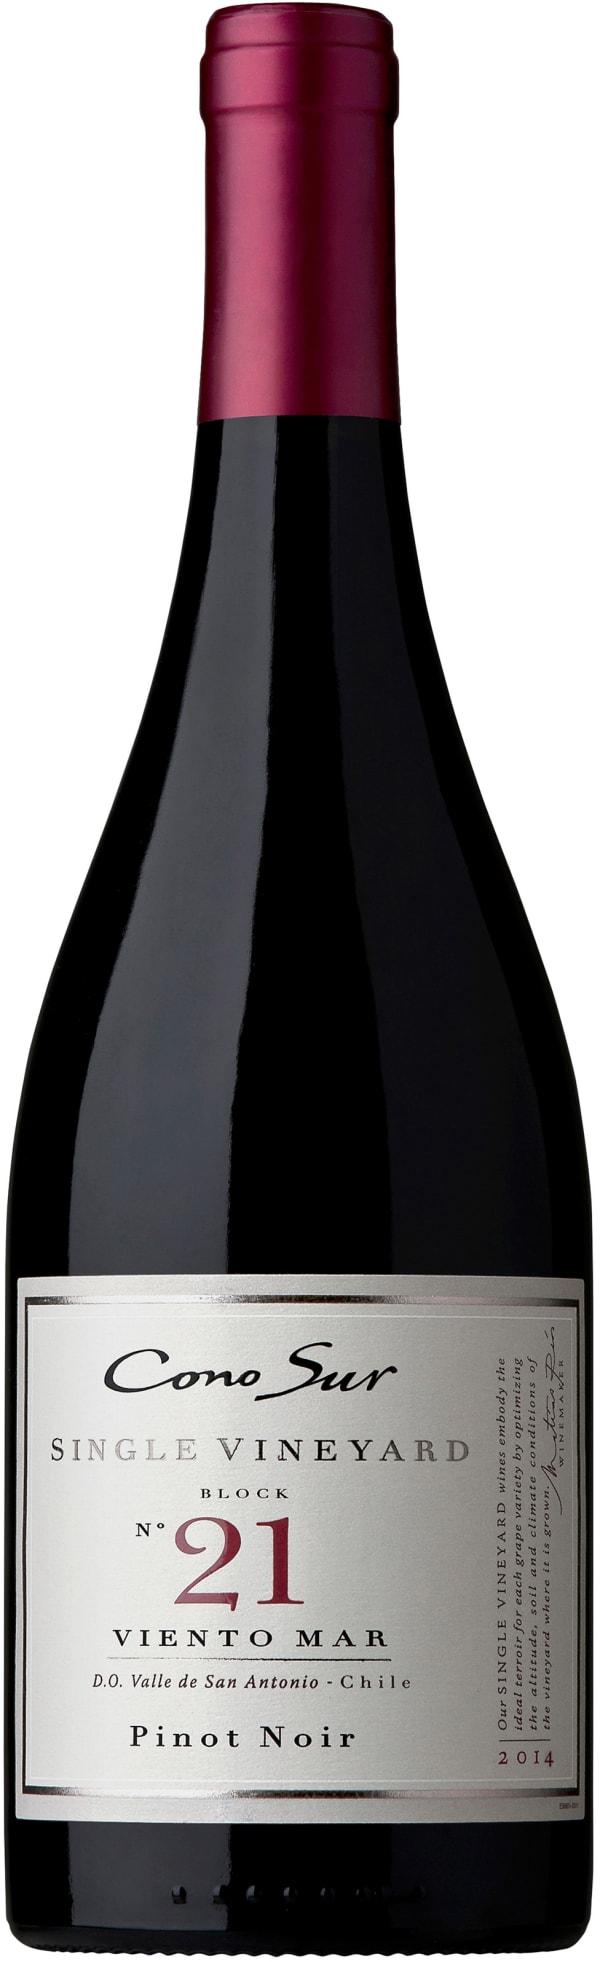 Cono Sur Single Vineyard Block 21 Pinot Noir 2017